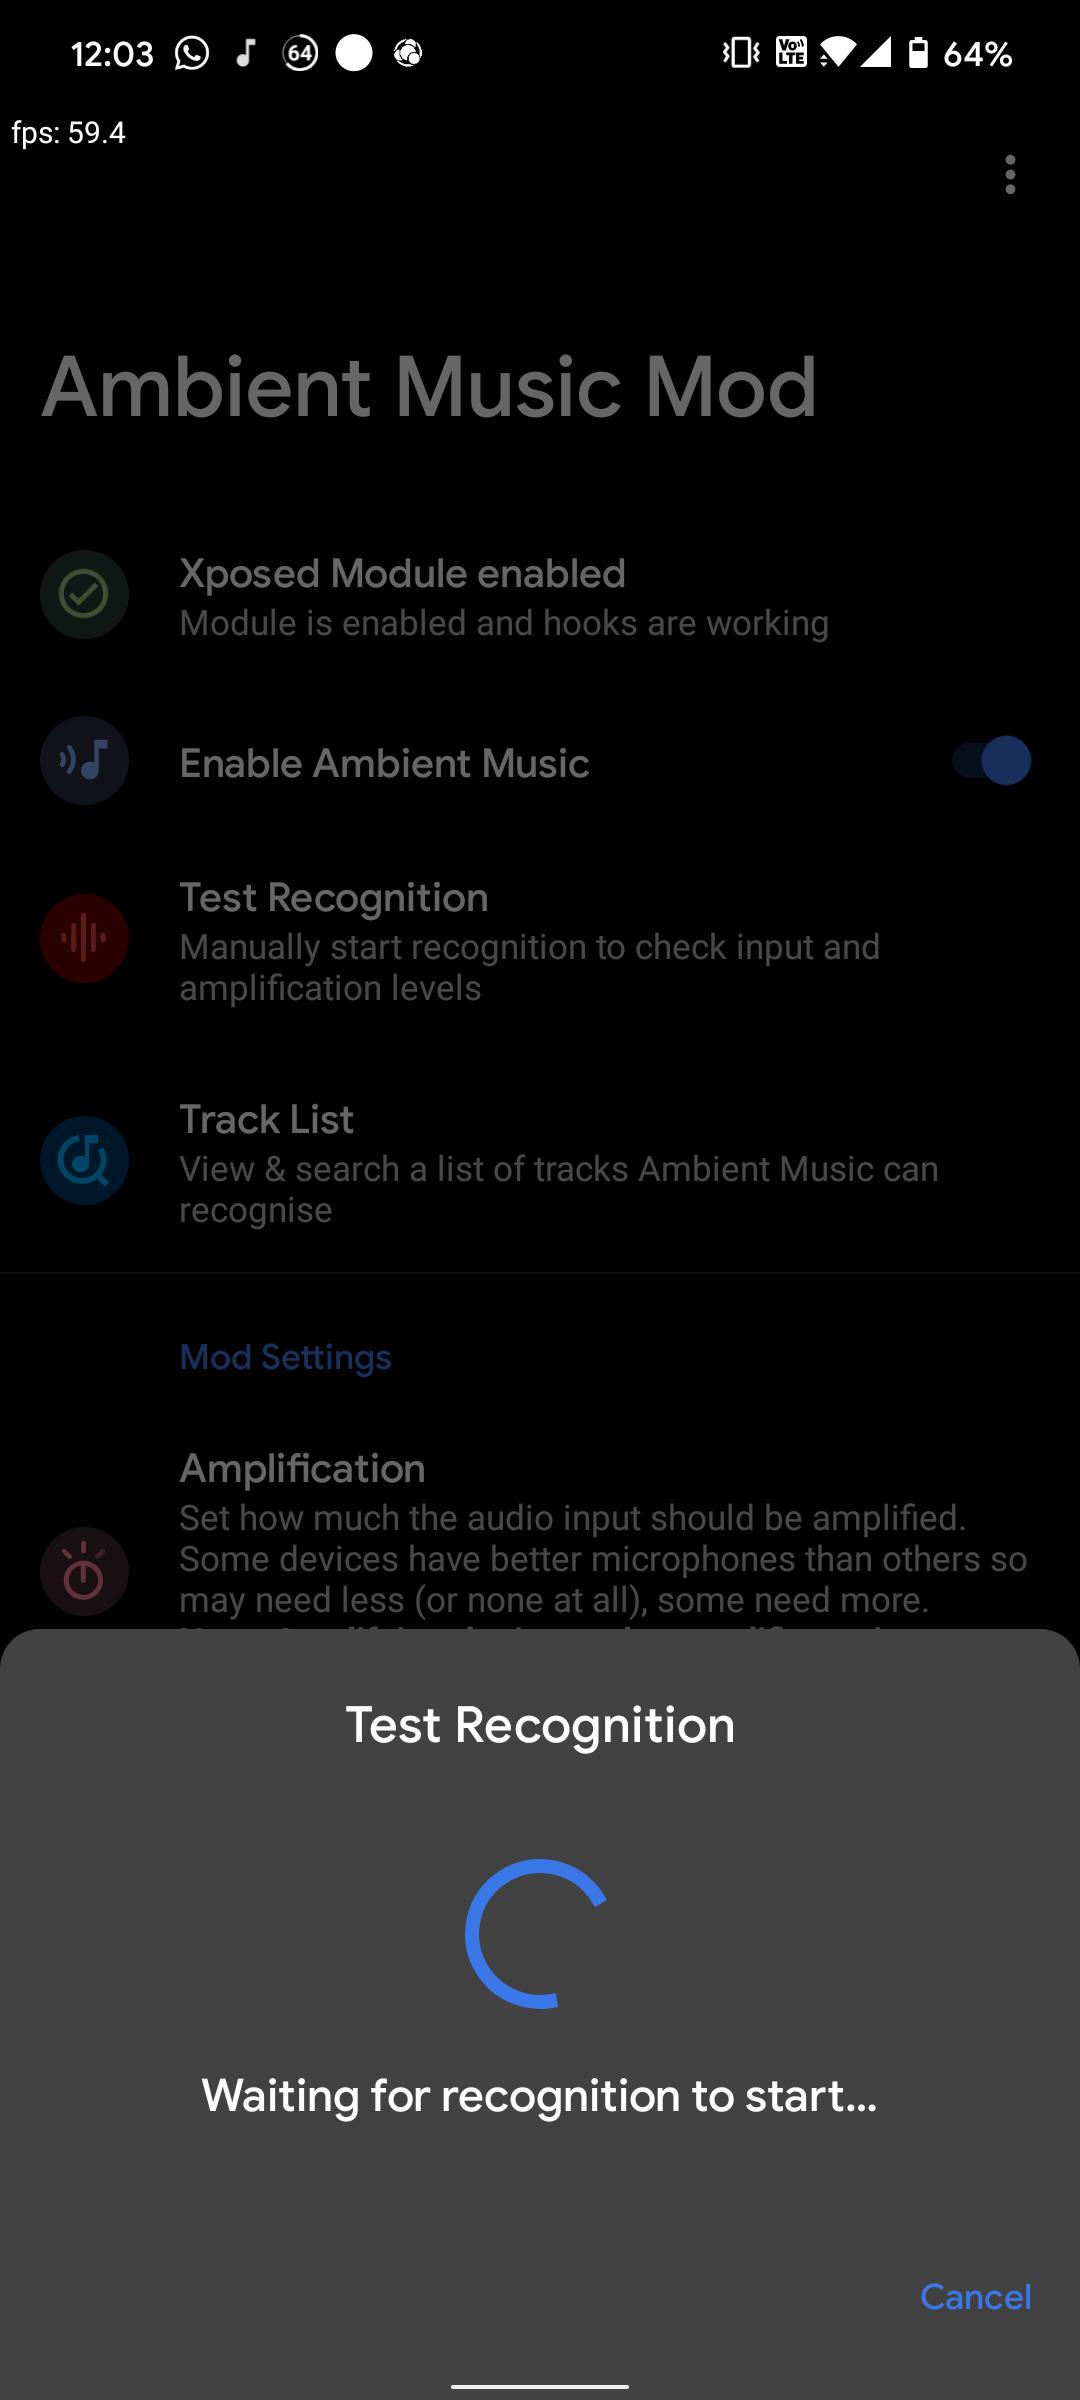 Screenshot_20210805-120308_Ambient_Music_Mod.png